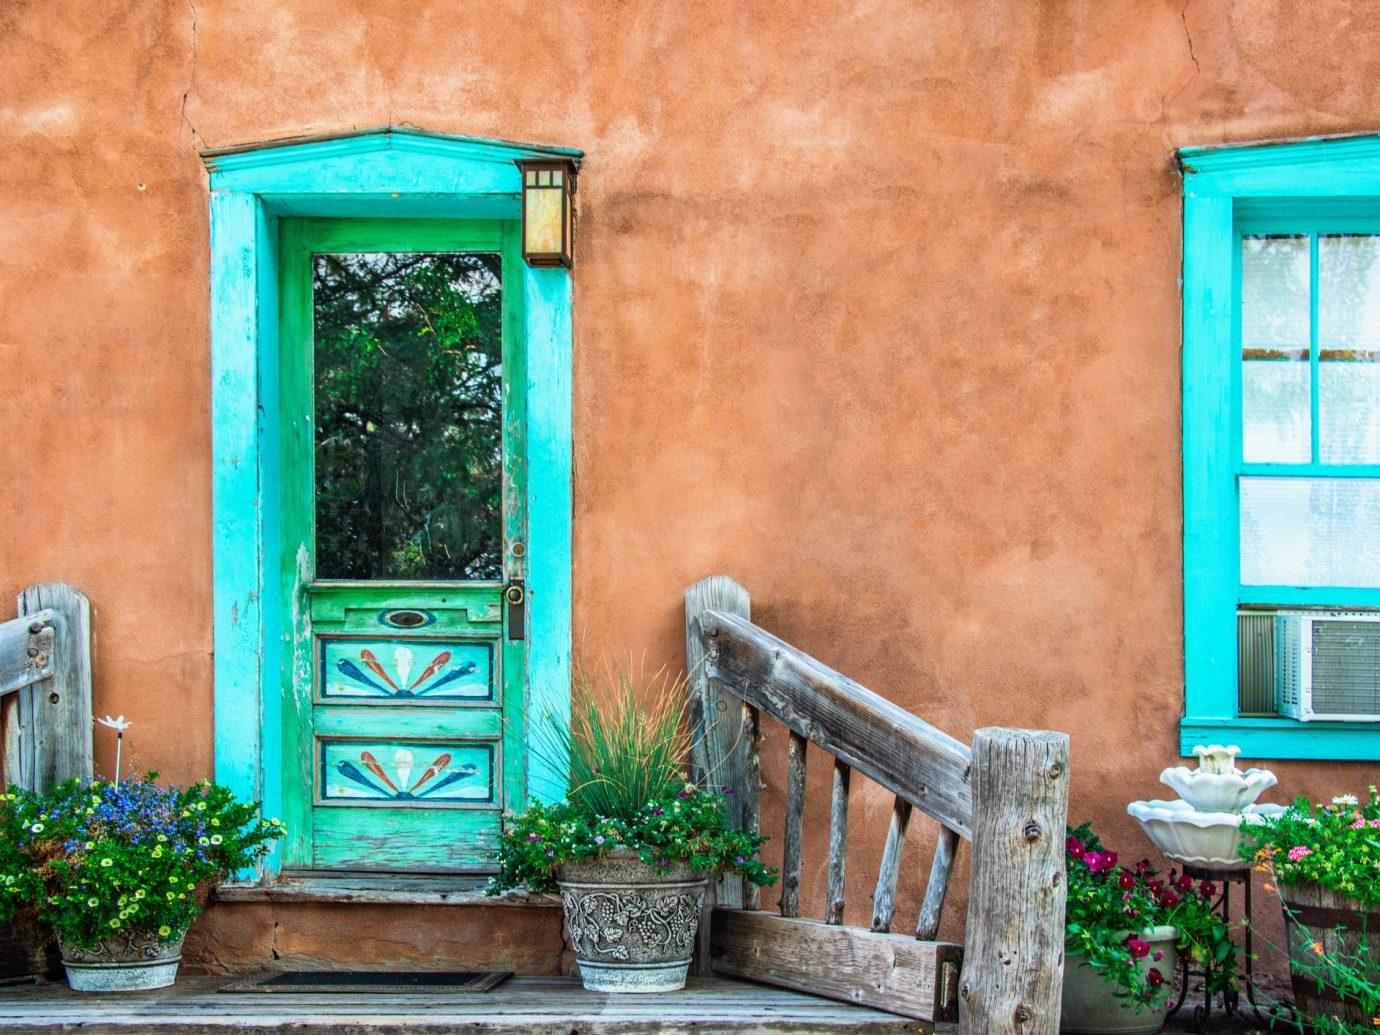 Offbeat building outdoor color green blue house wall home window estate door porch interior design facade backyard Garden mansion cottage Courtyard old stone surrounded